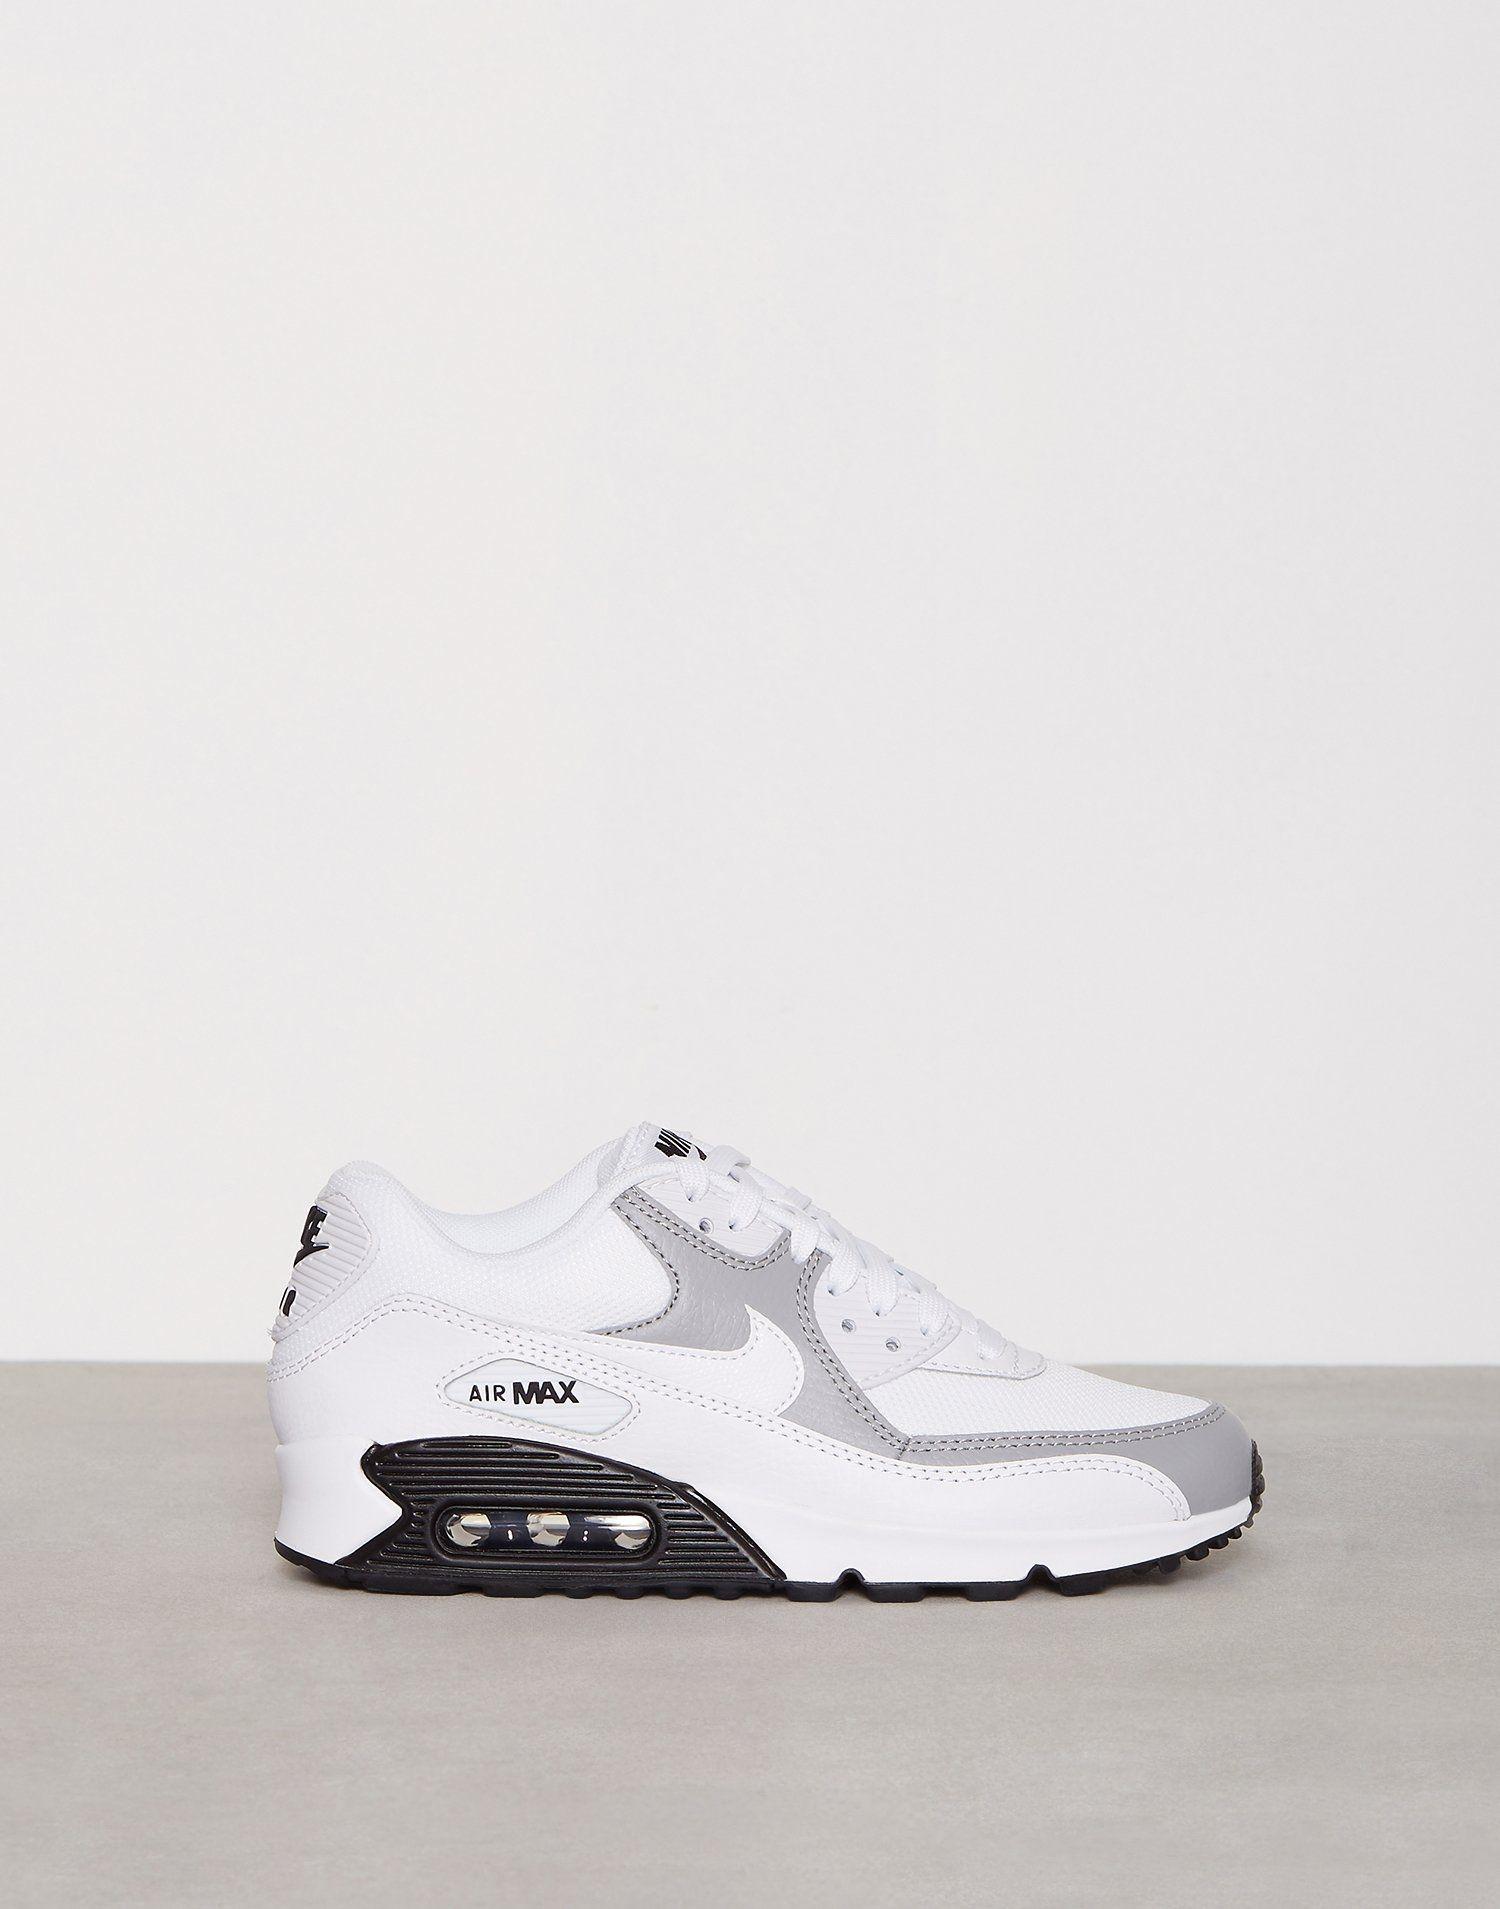 eda39de2 Air Max 90 - Nike - Hvit/Grå - Sneakers - Sko - Kvinne - Nelly.com ...